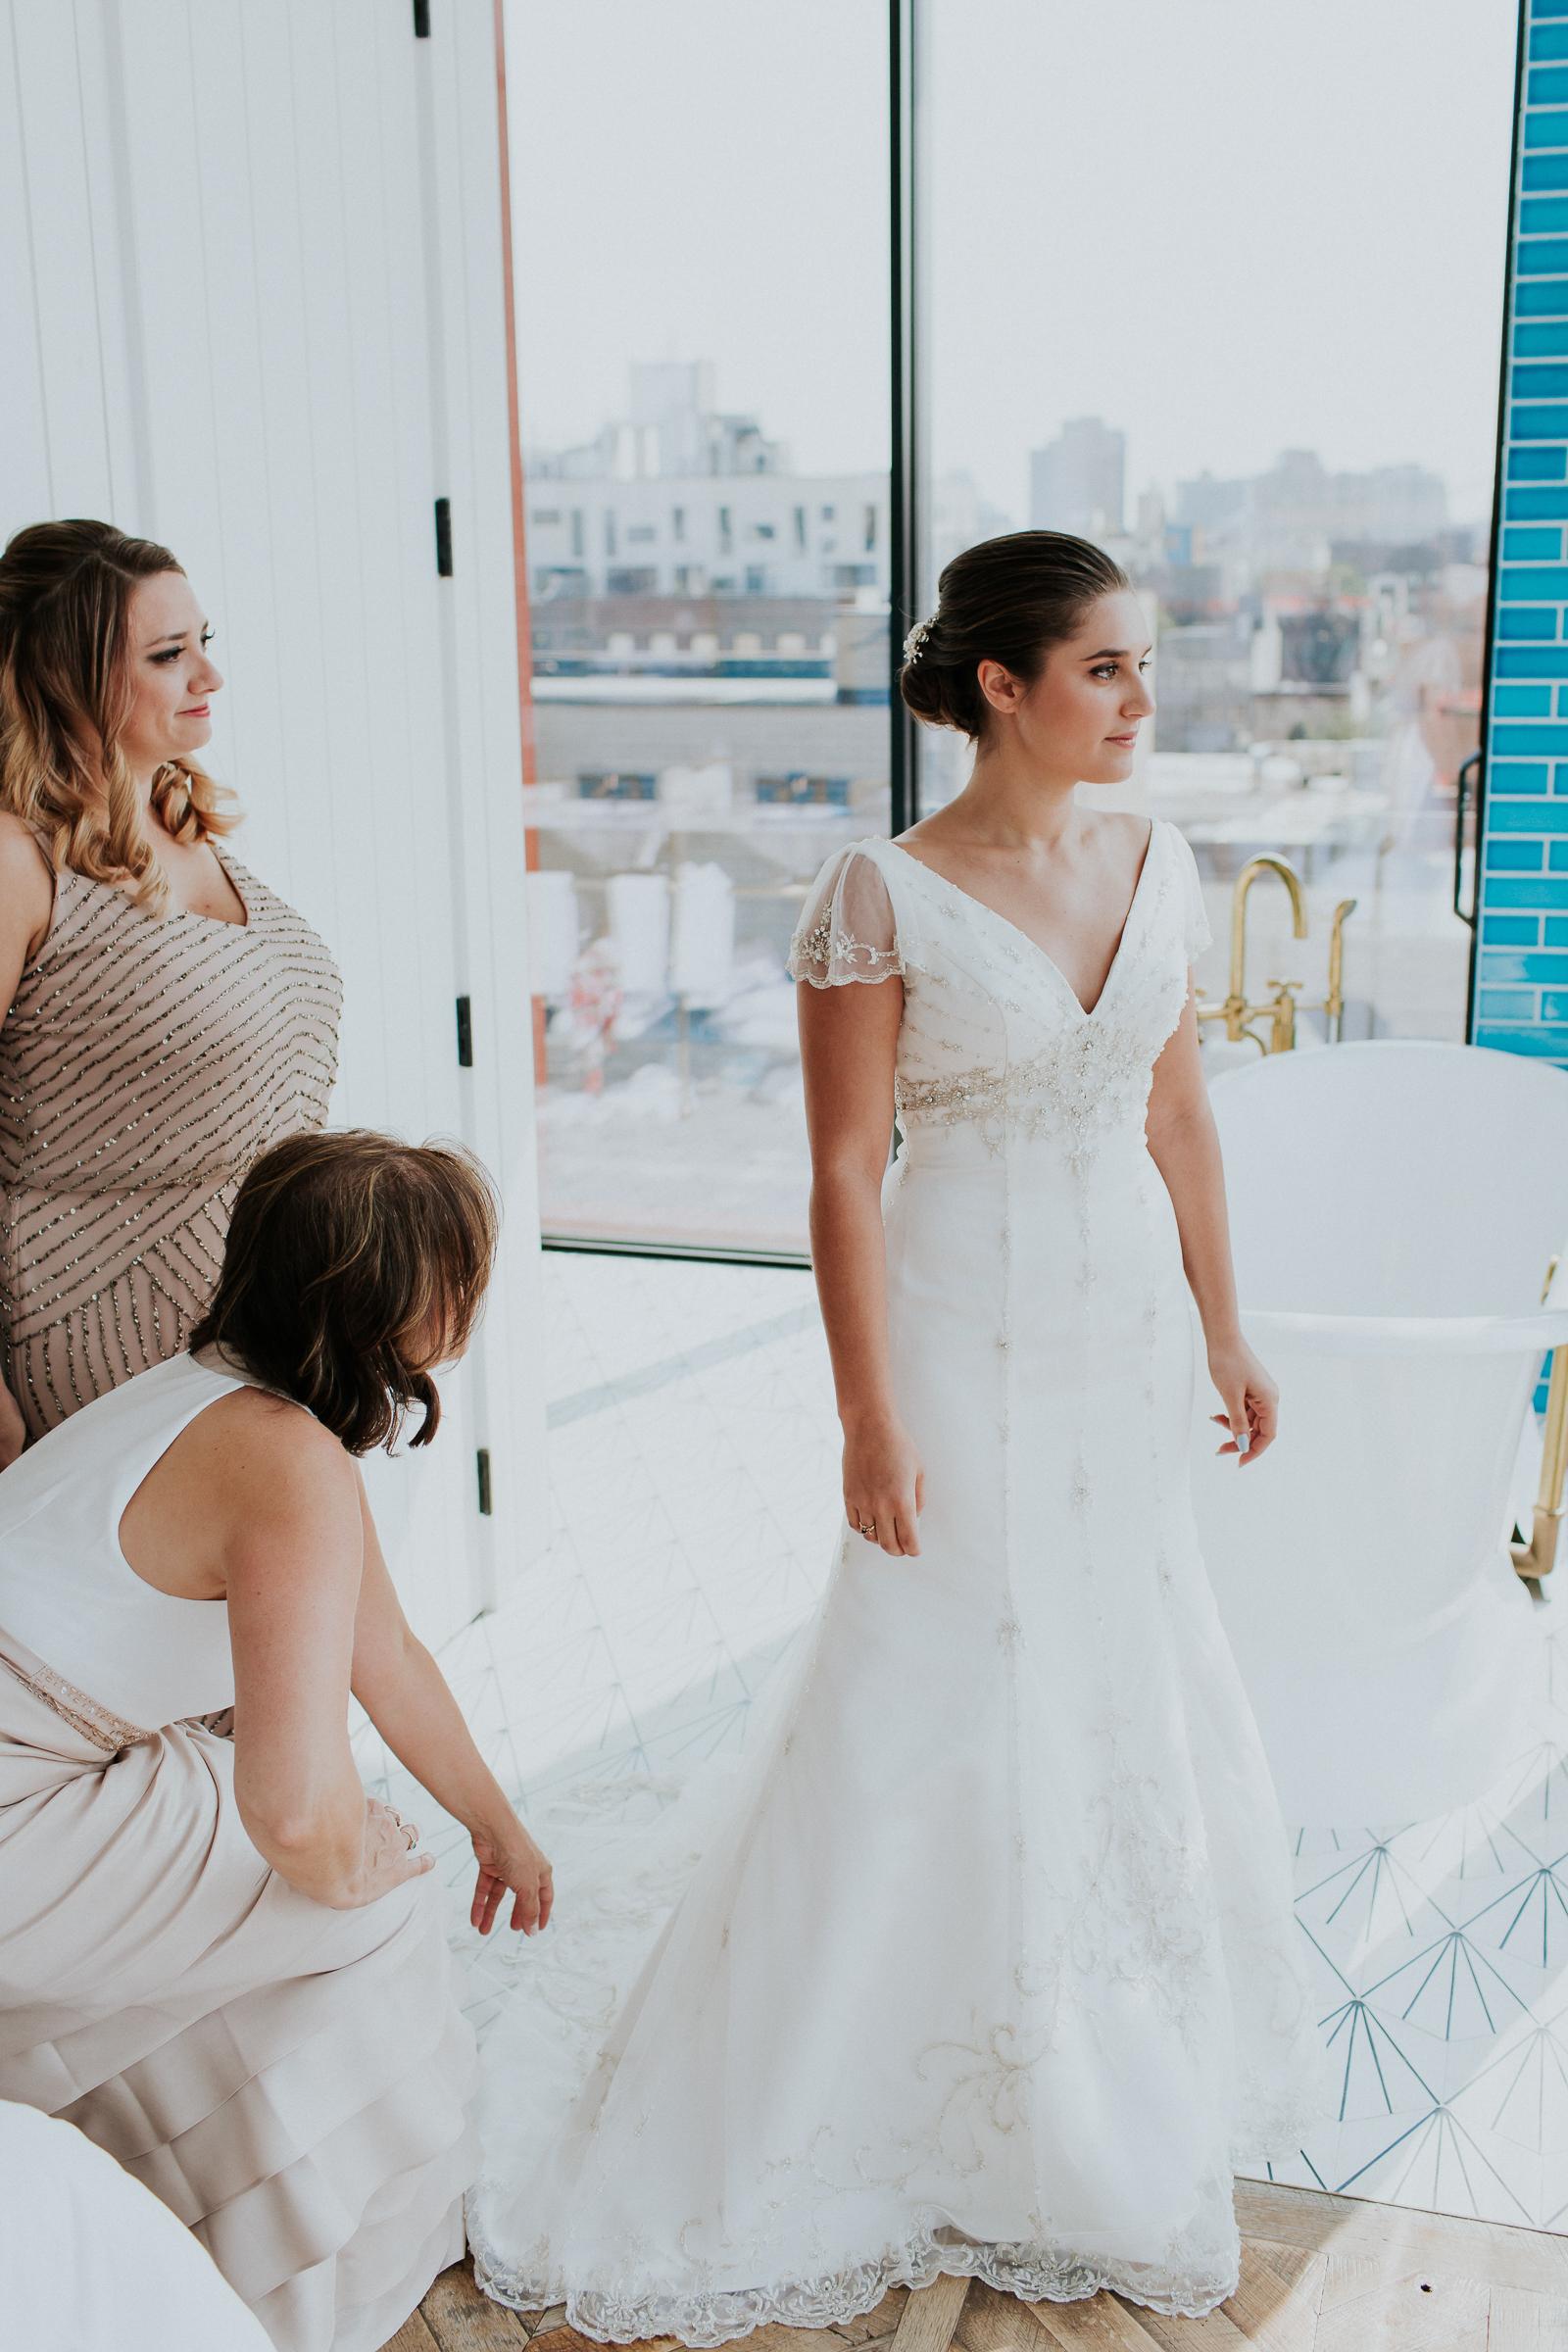 Brooklyn-Winery-NYC-Editorial-Documentary-Wedding-Photographer-Gina-Oli-11.jpg